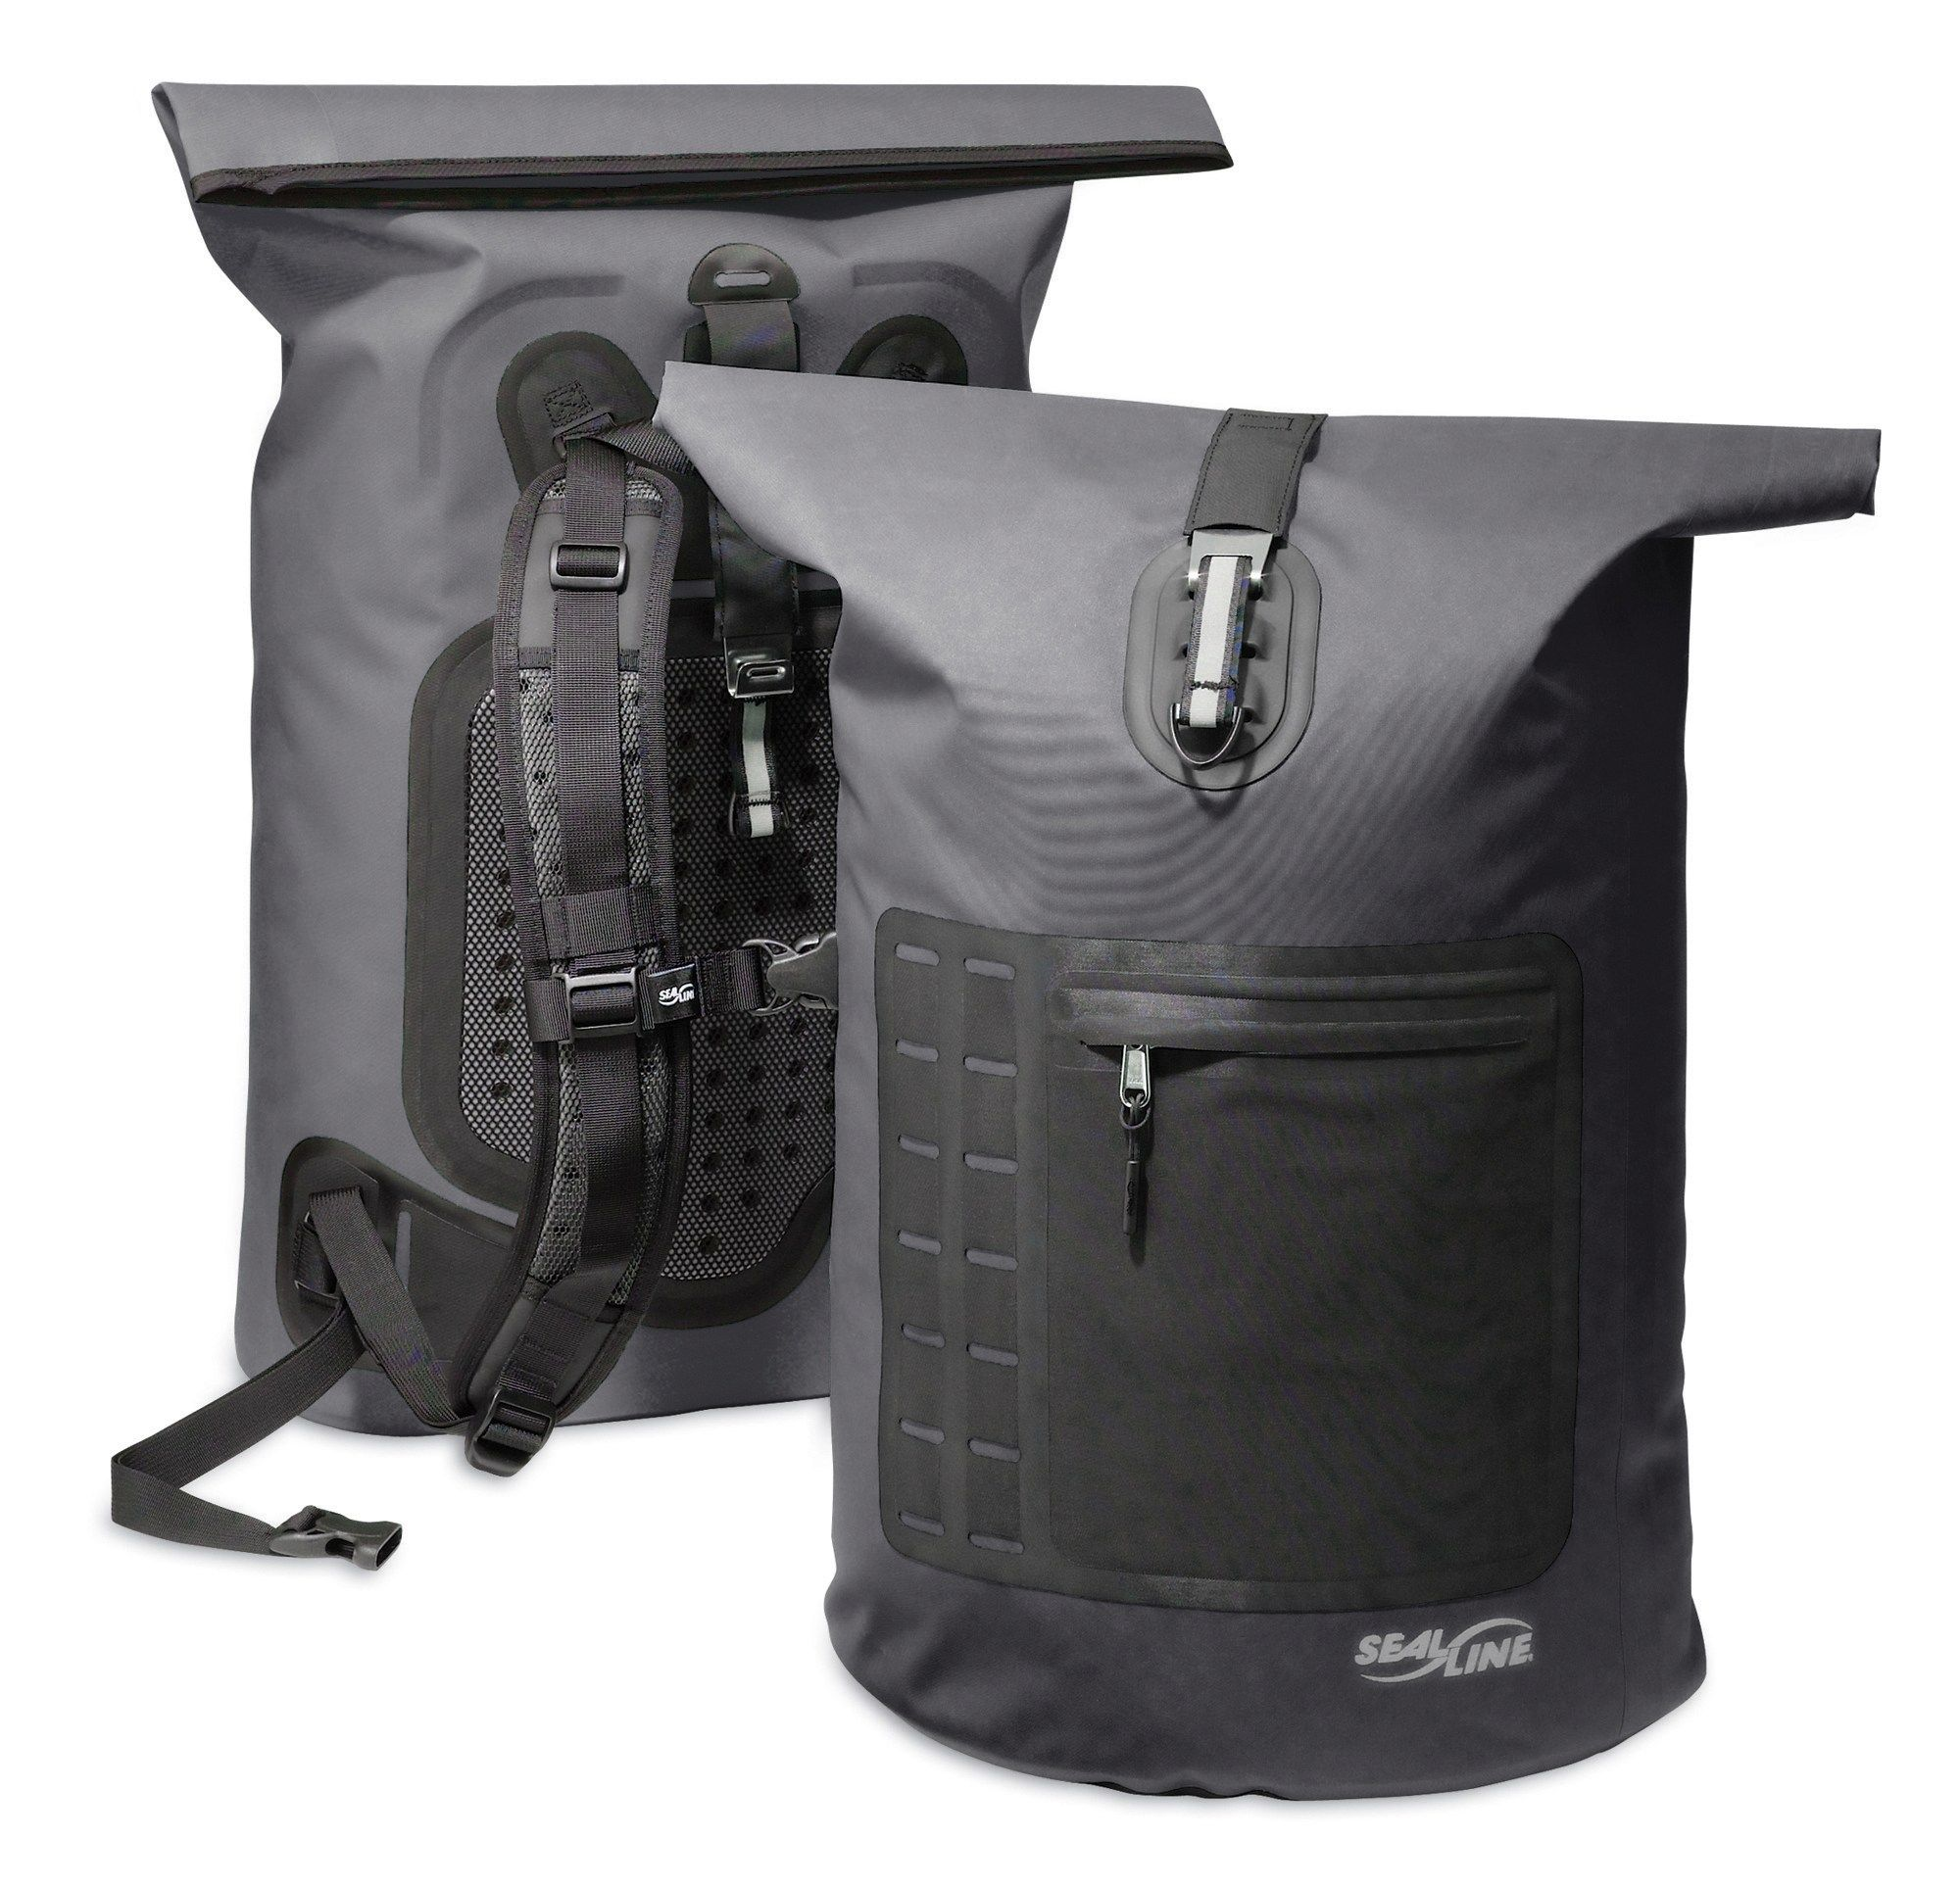 SealLine Urban Backpack - Small - REI.com   Urban Survival Methods ... dec6a30c4c